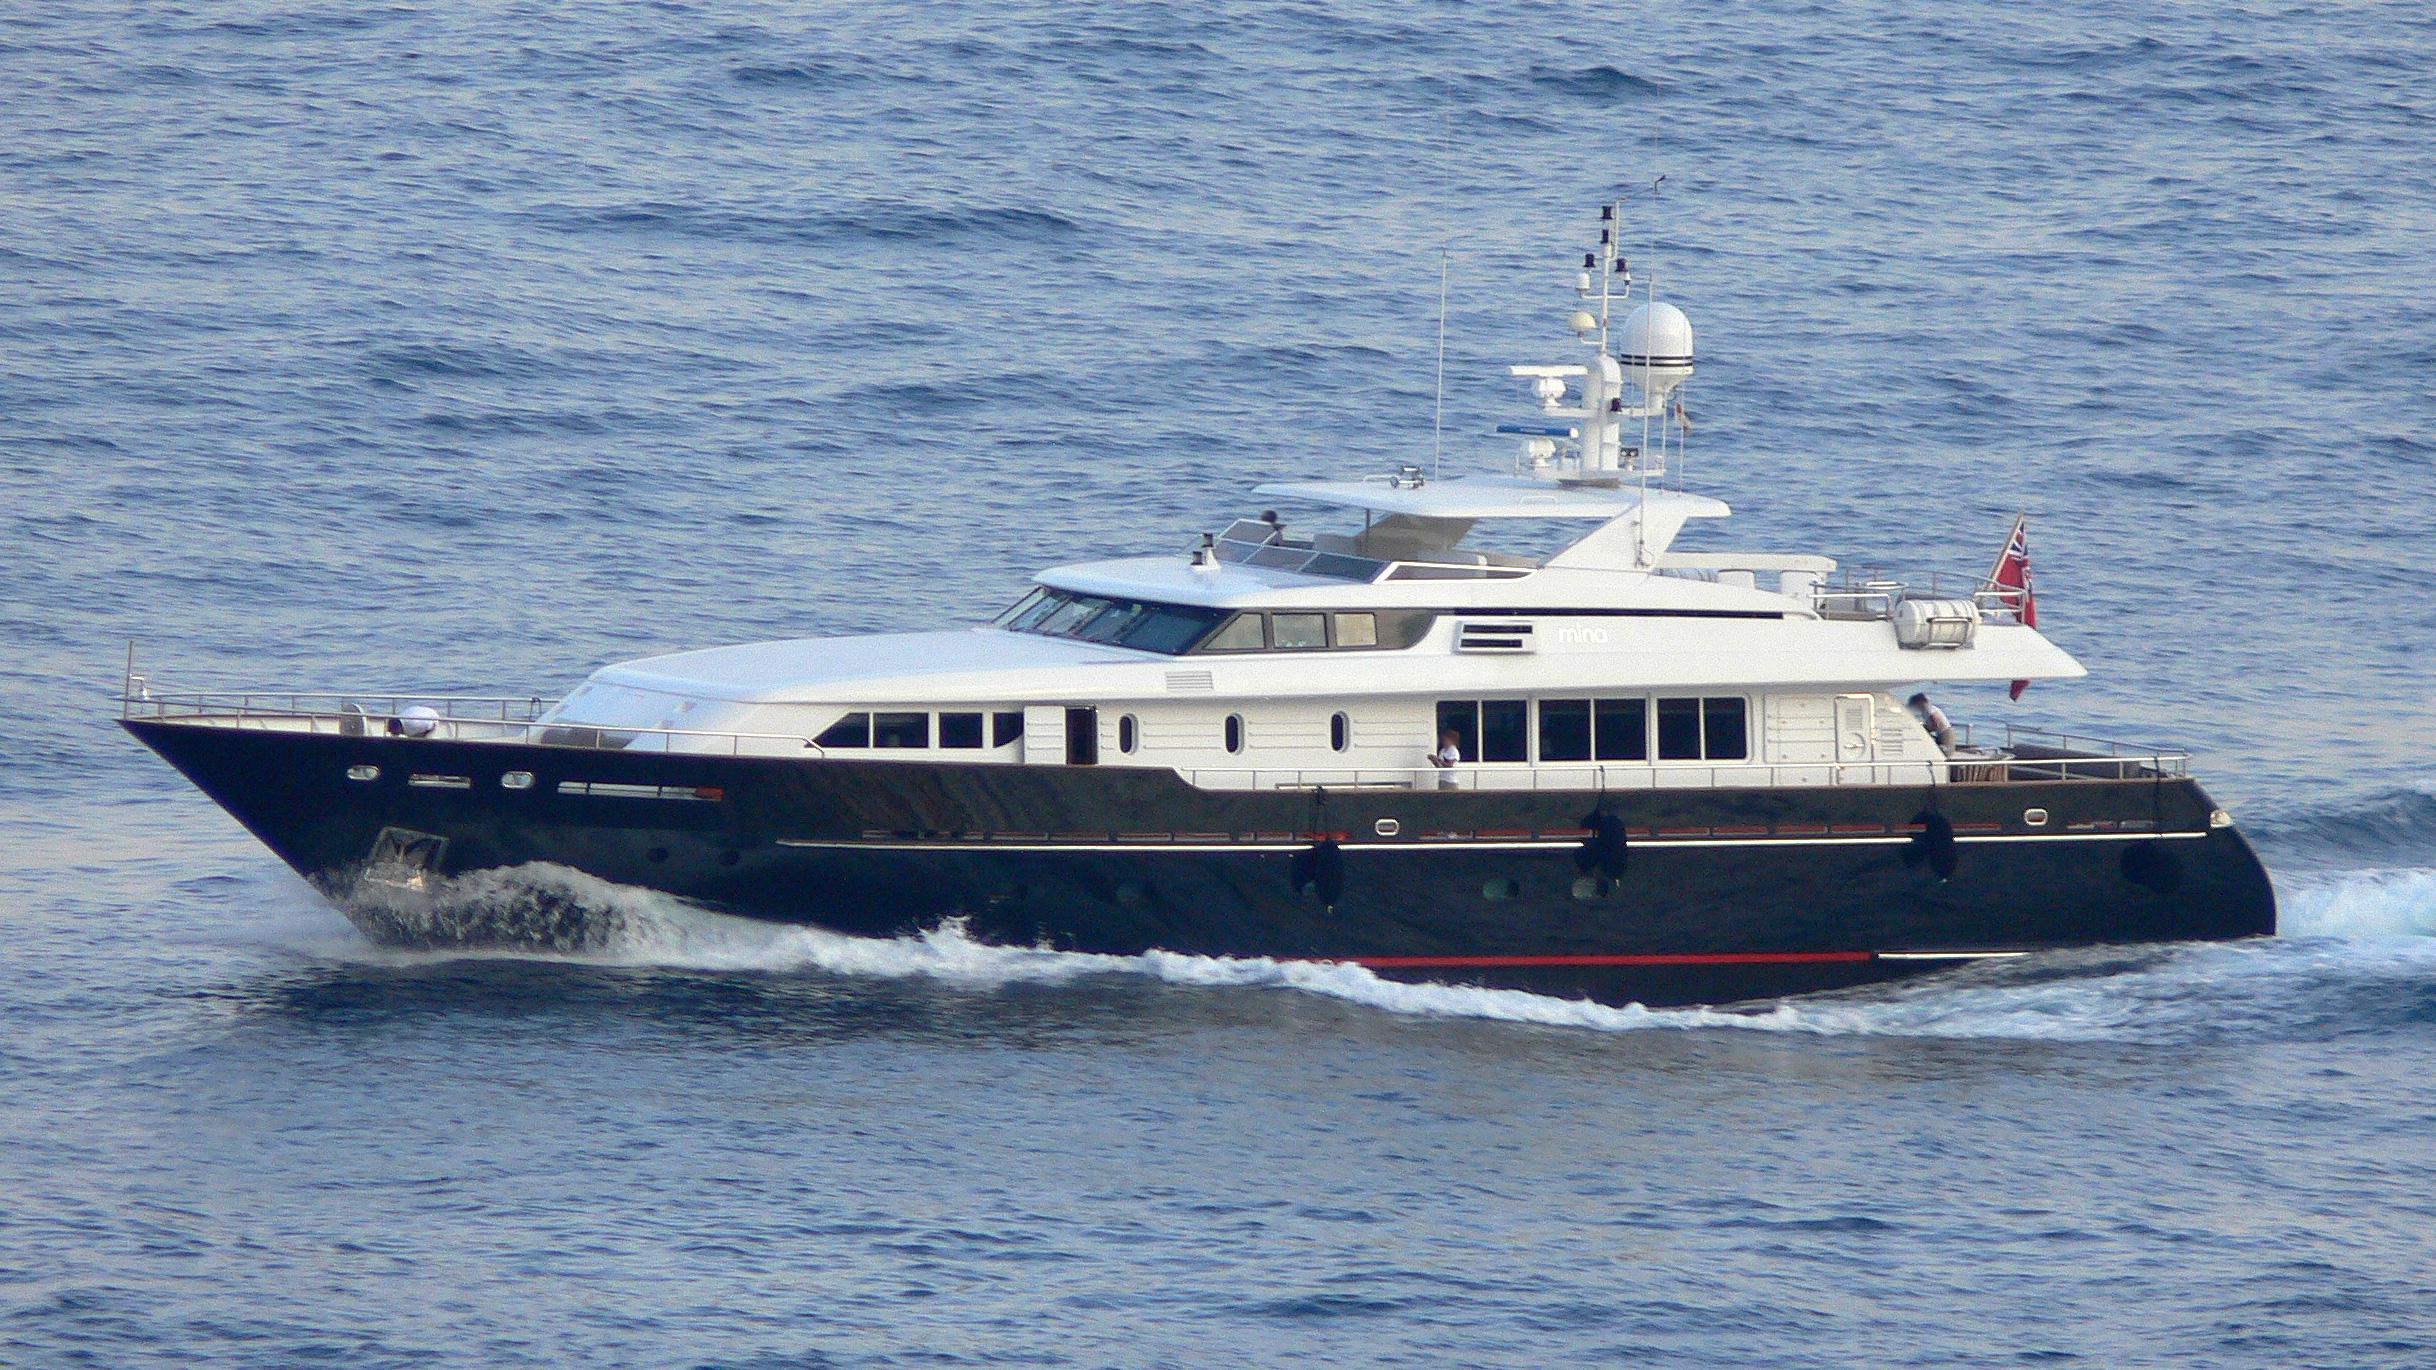 kingfish-mina-motor-yacht-codecasa-2003-35m-profile